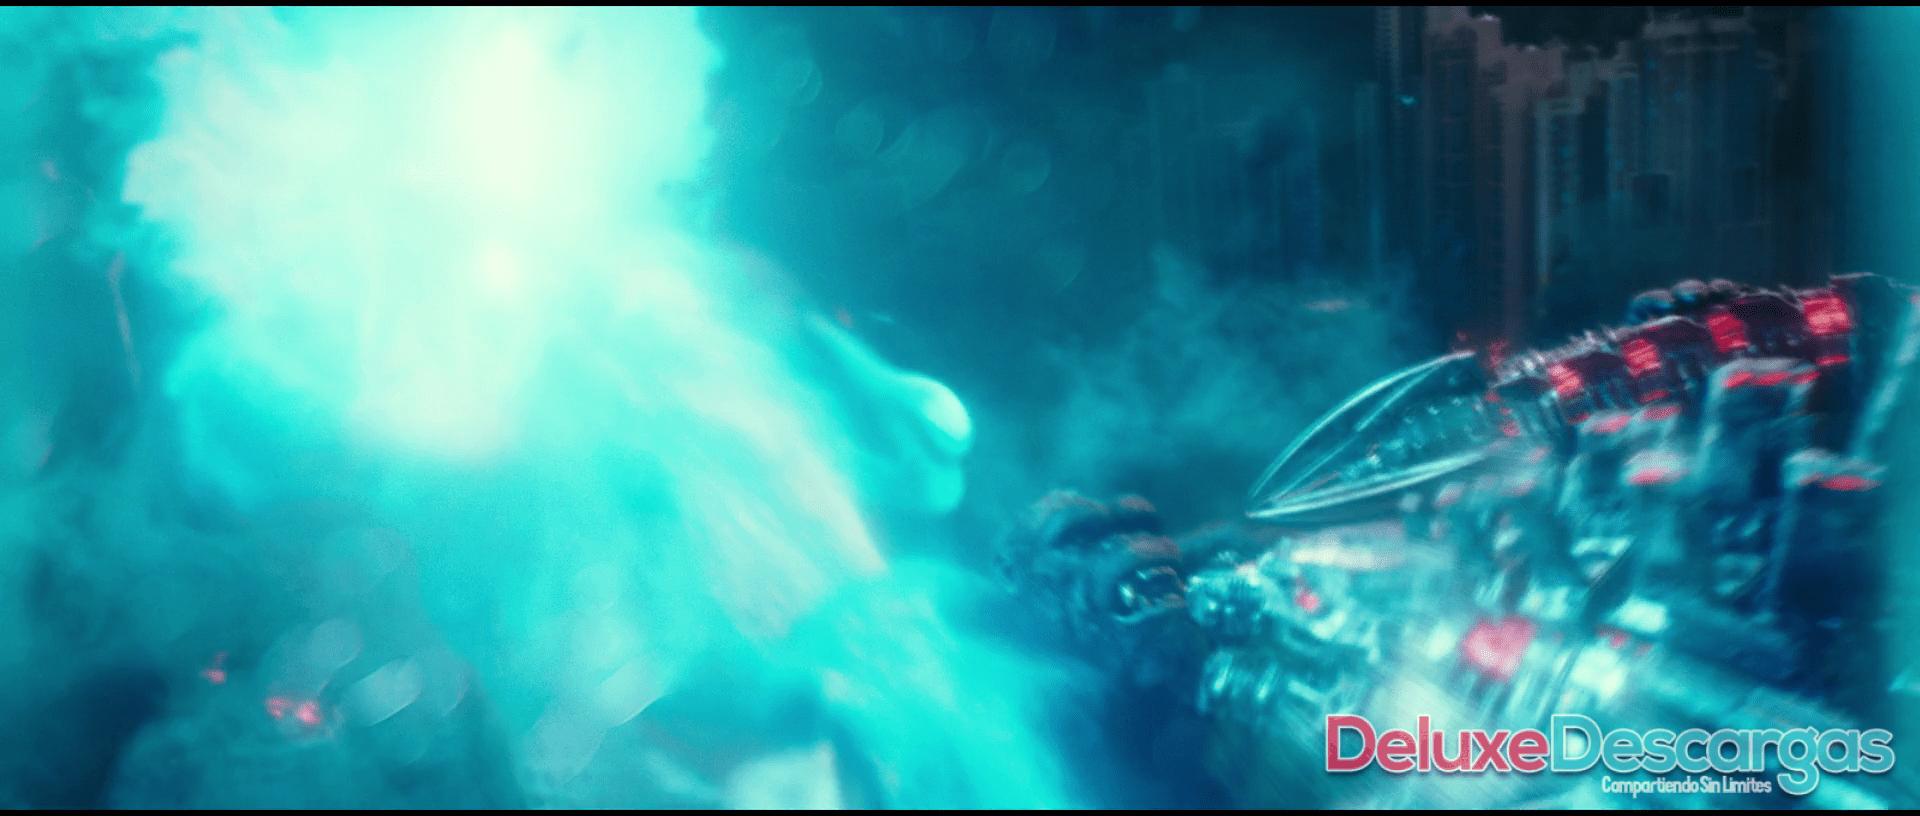 Godzilla vs Kong 1080p (9) min